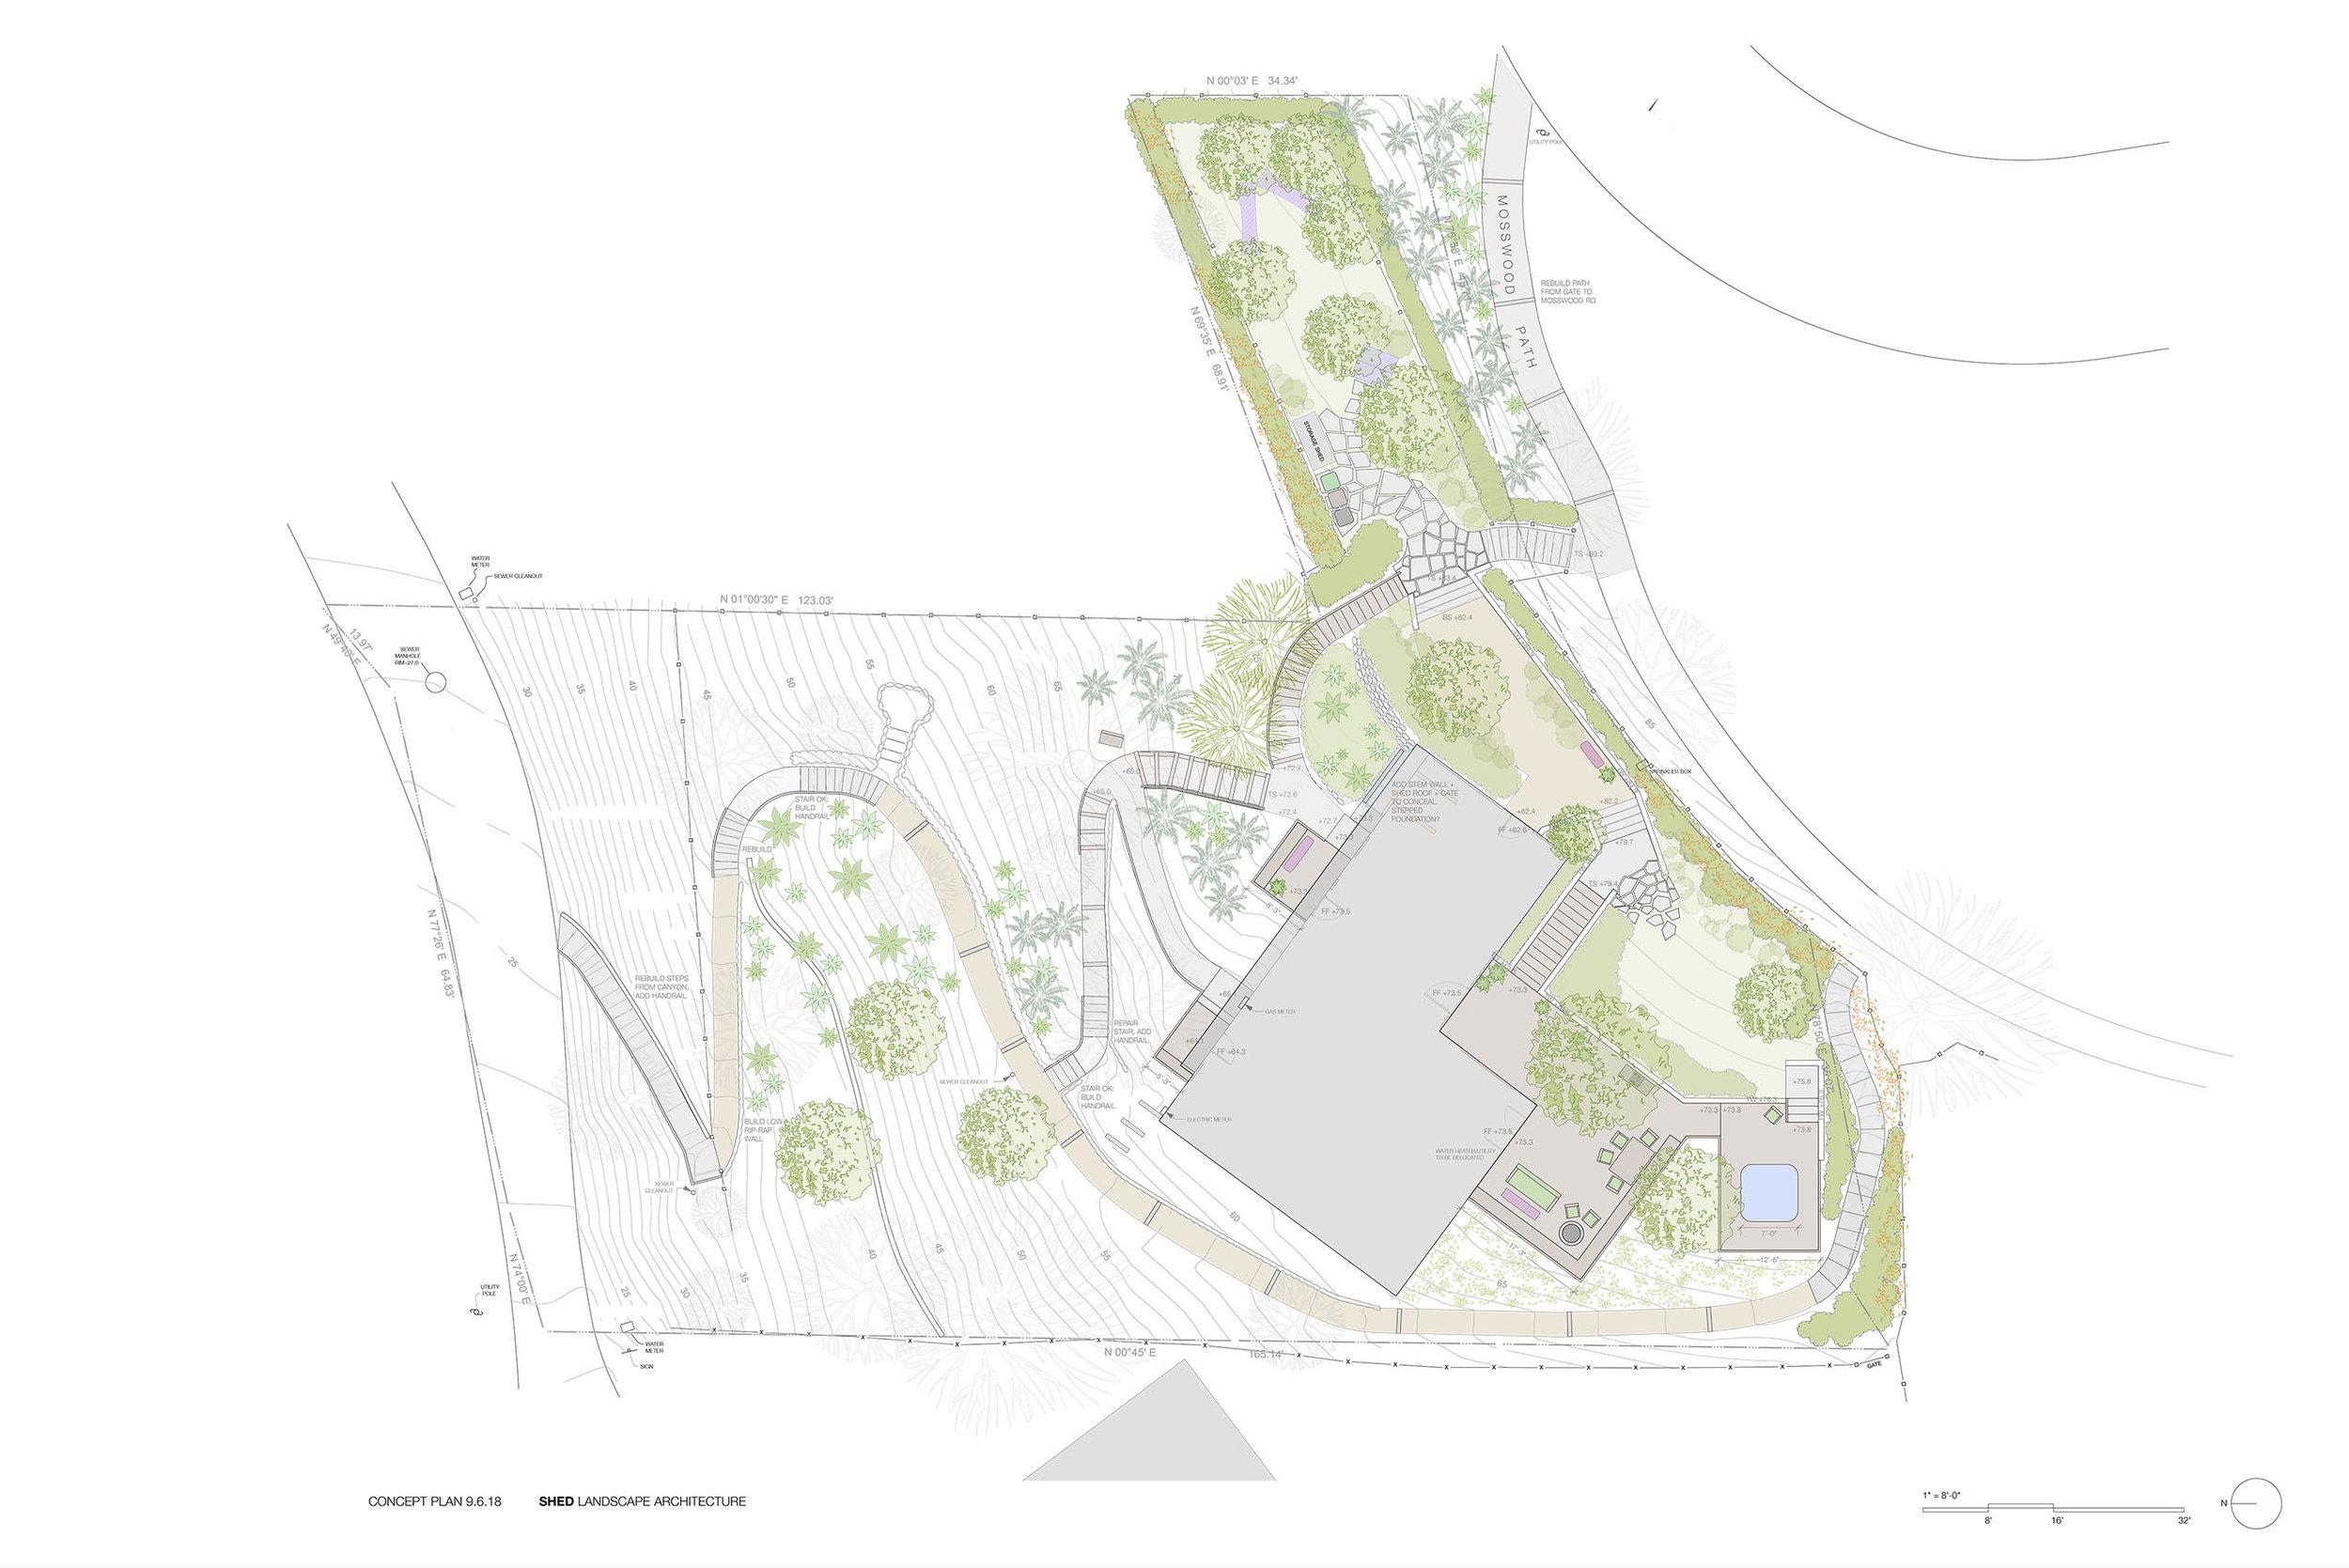 180905 33 Canyon Rd landscape concept plan.jpg